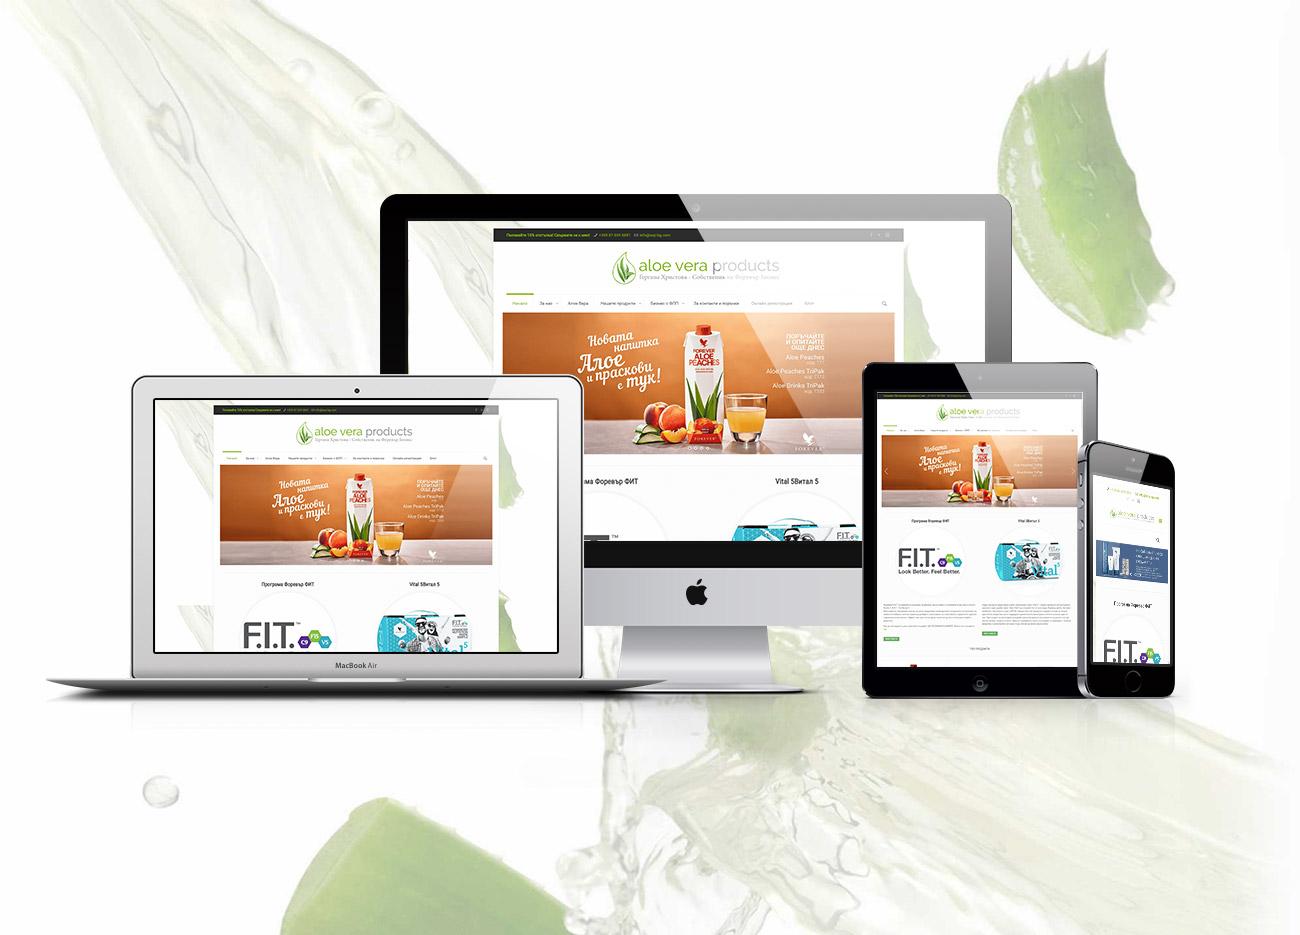 desing-360-онлайн продуктов каталог Aloe Vera Products